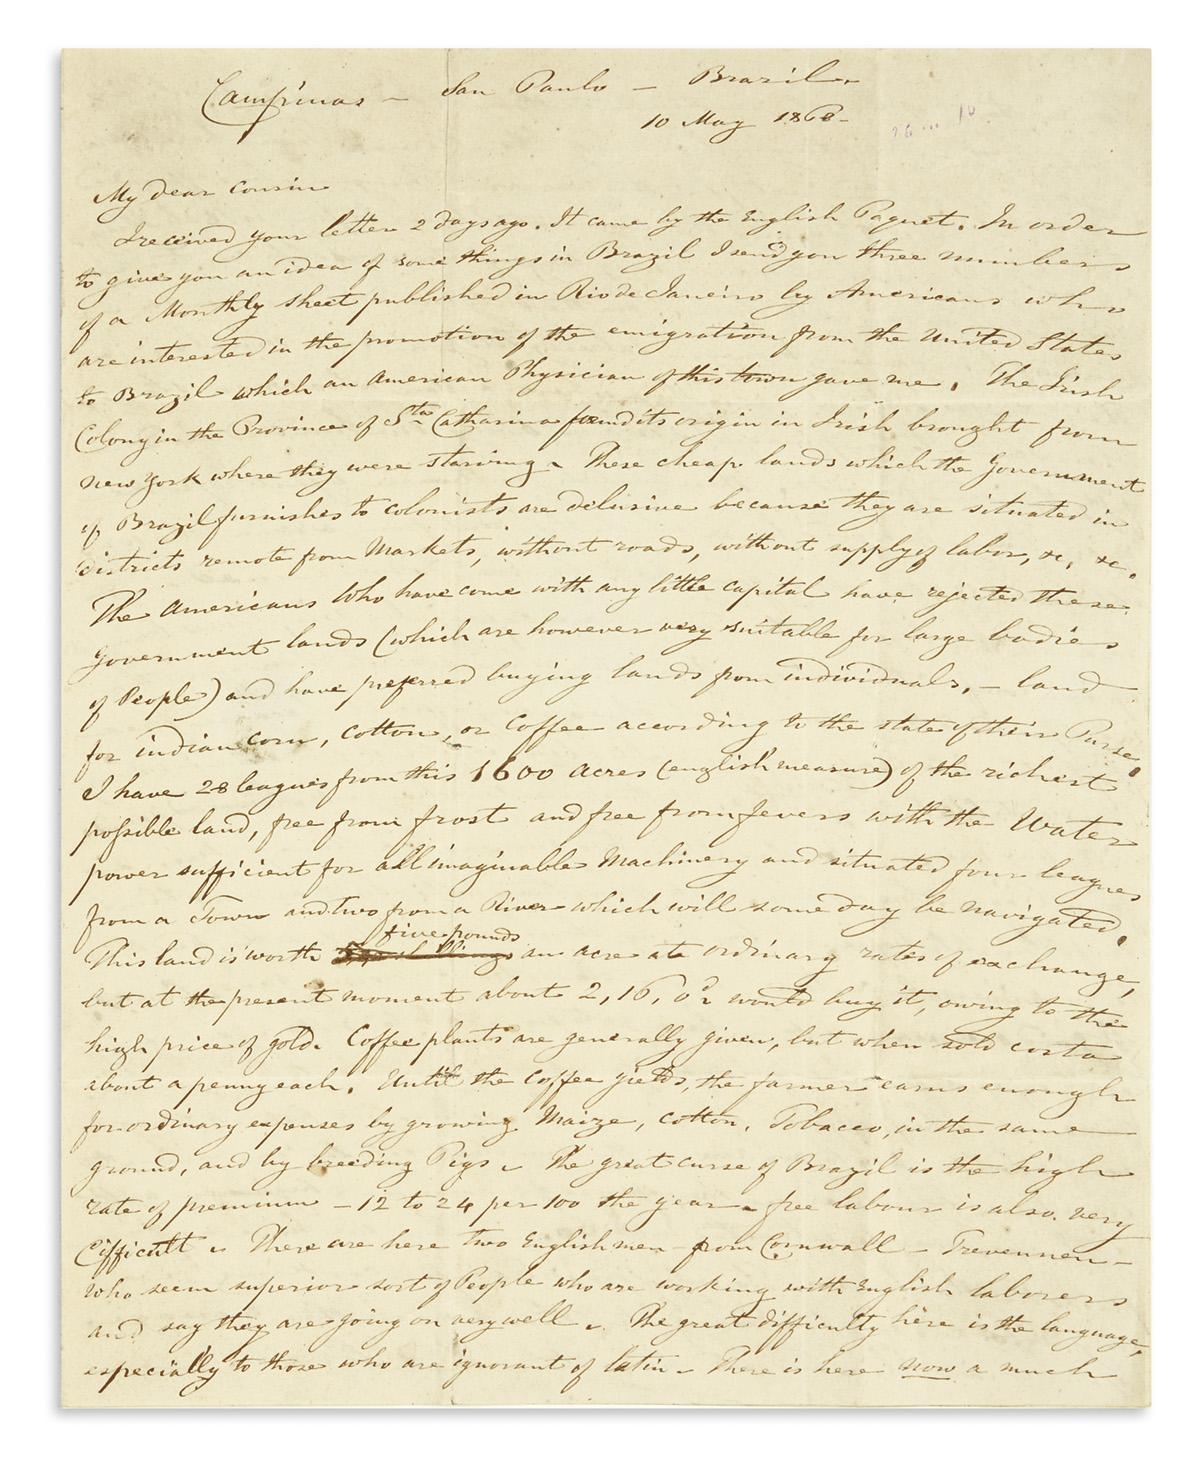 (BRAZIL)-Daunt-Richard-Gumbleton-Letter-describing-Irish-imm